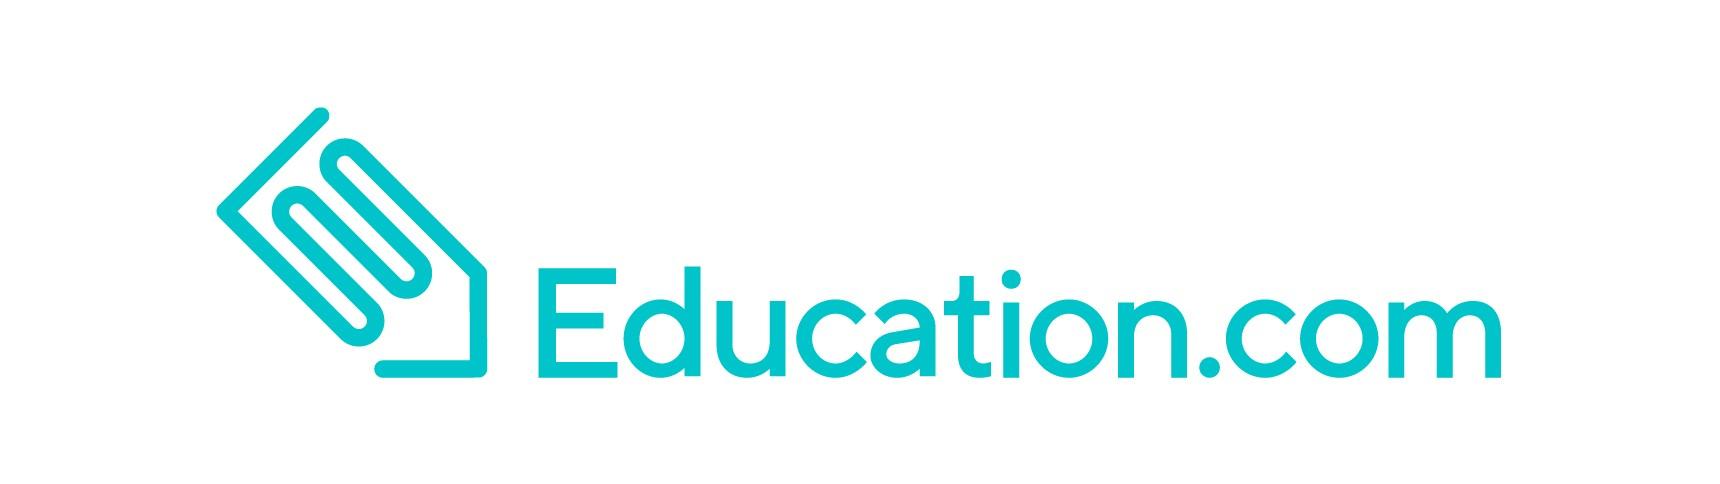 Education.com   LinkedIn